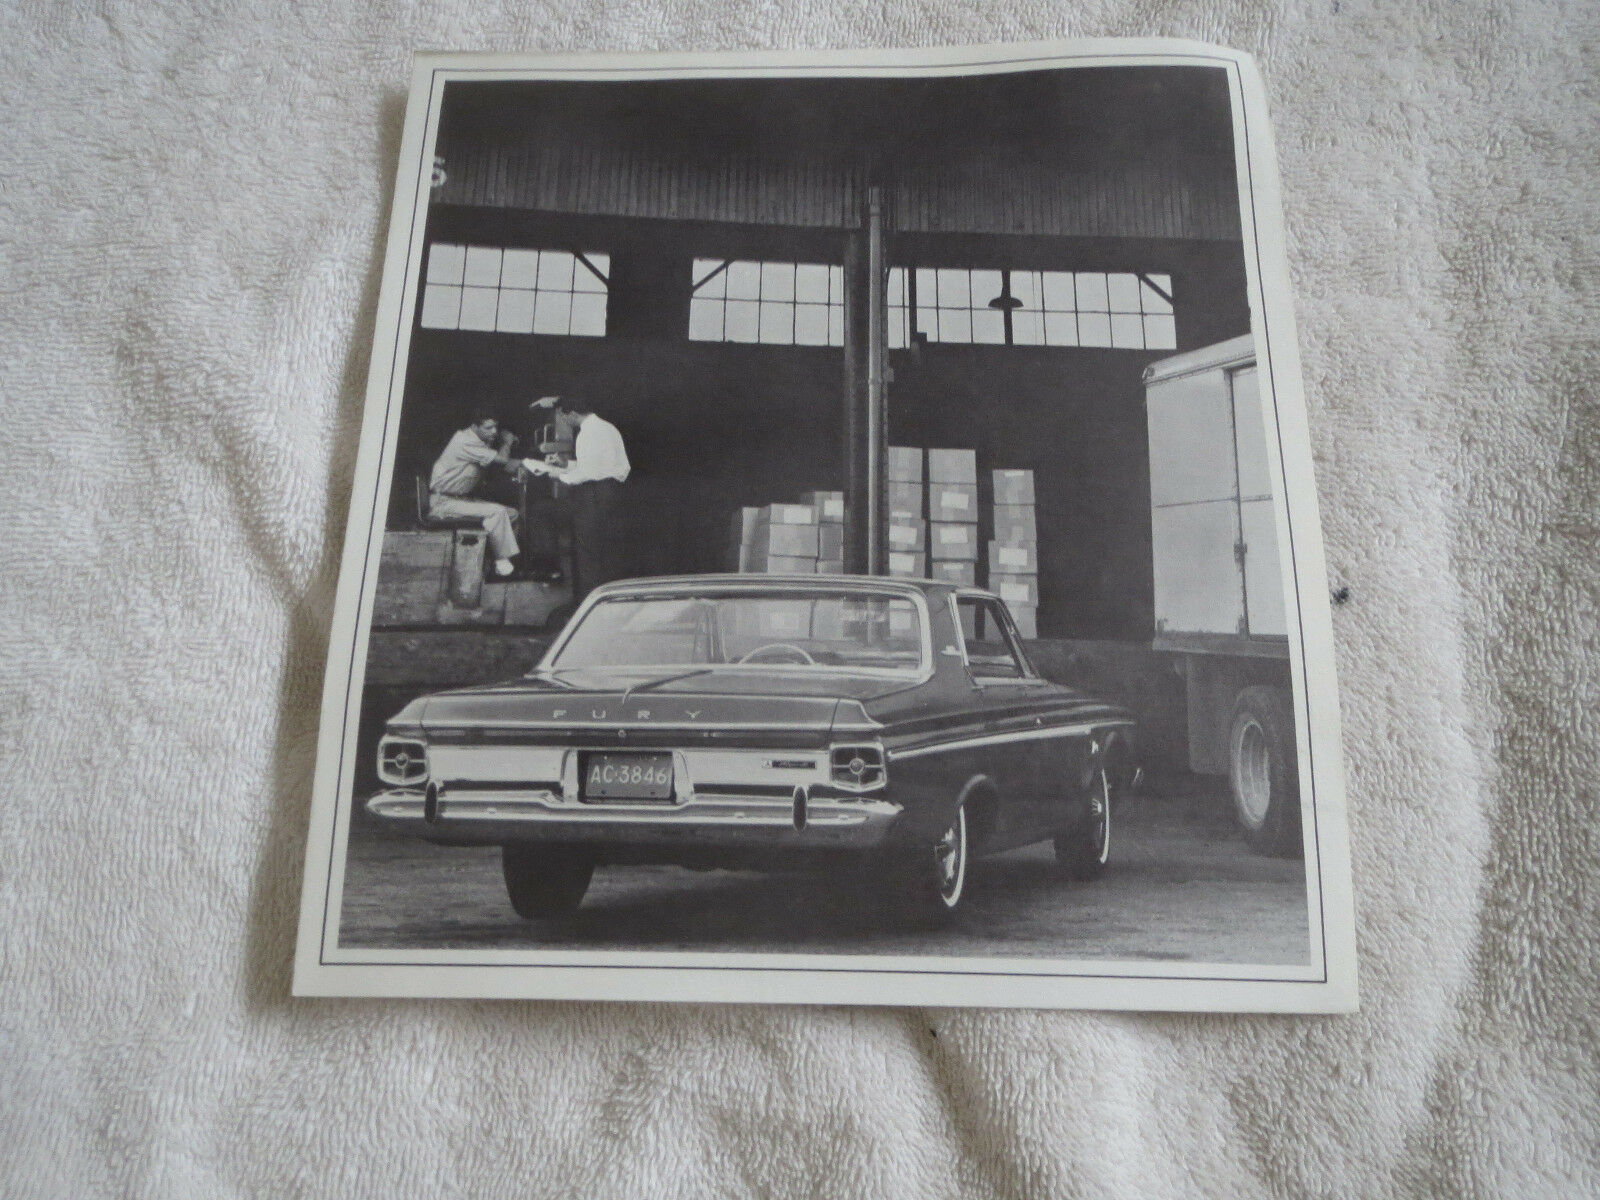 1963 PLYMOUTH FURY FLEET CAR FOR BUSINESS ORIGINAL DEALERSHIP SALES BROCHURE